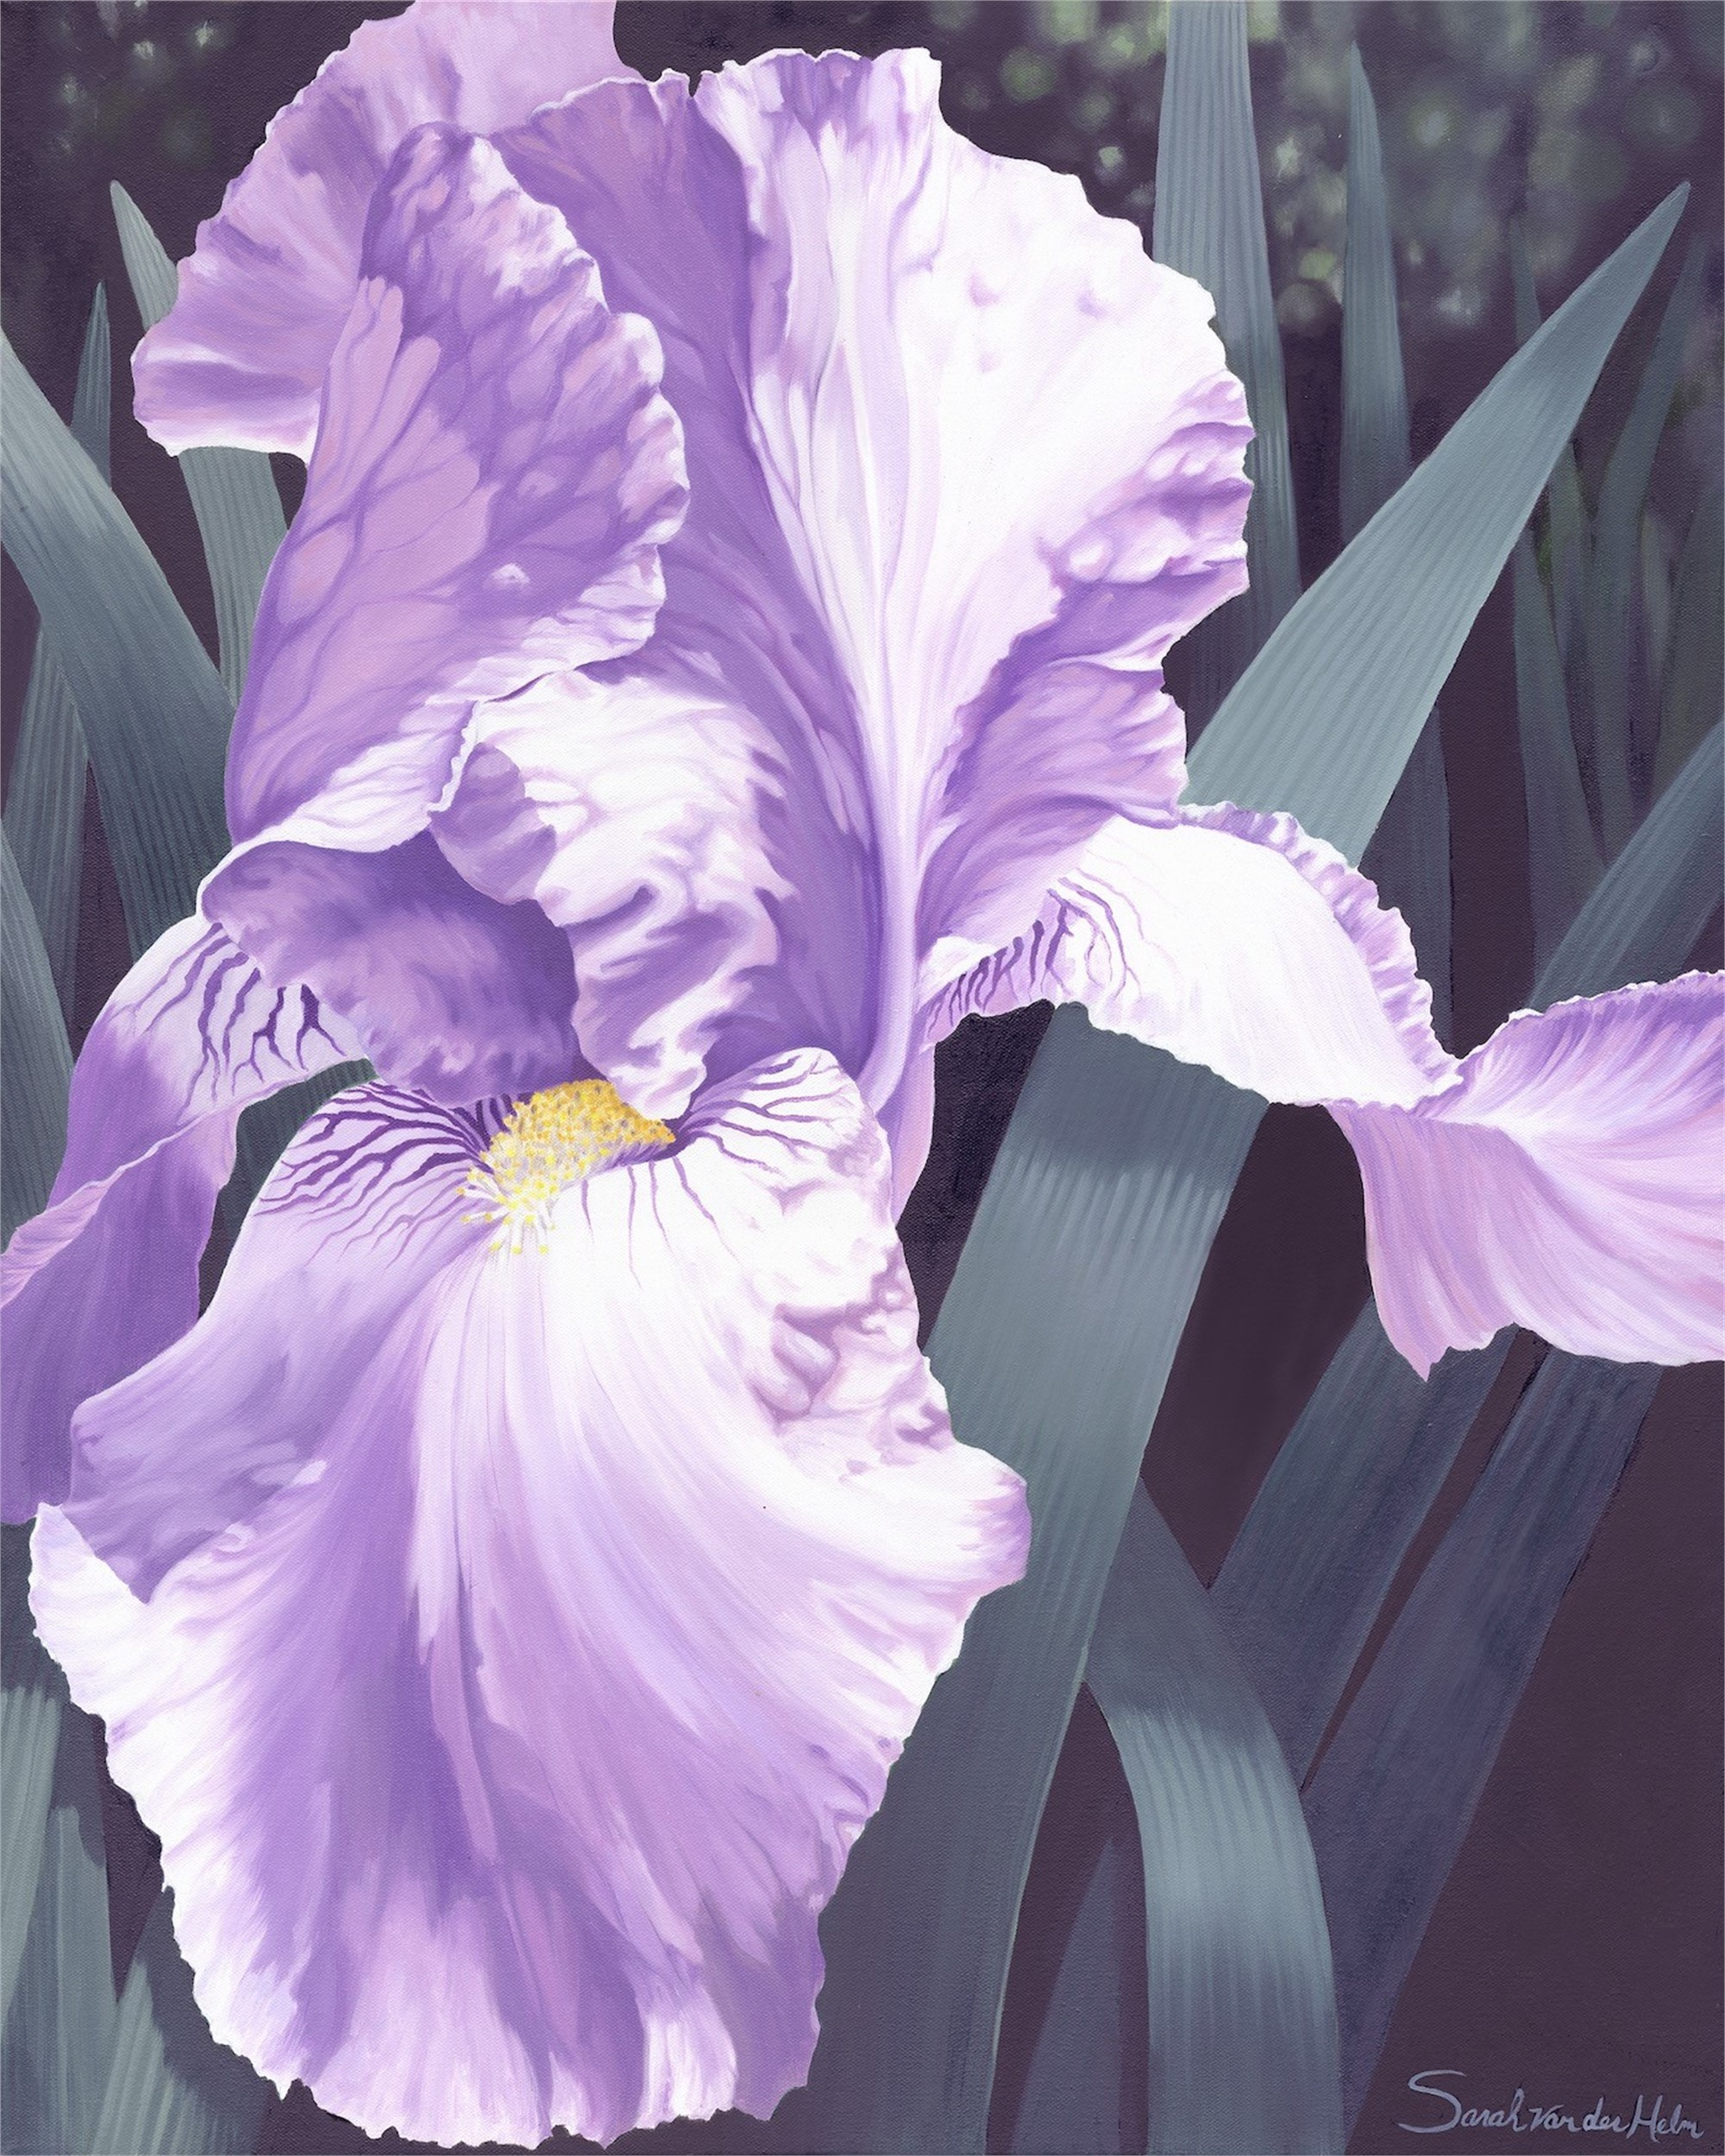 Iris II by Sarah van der Helm